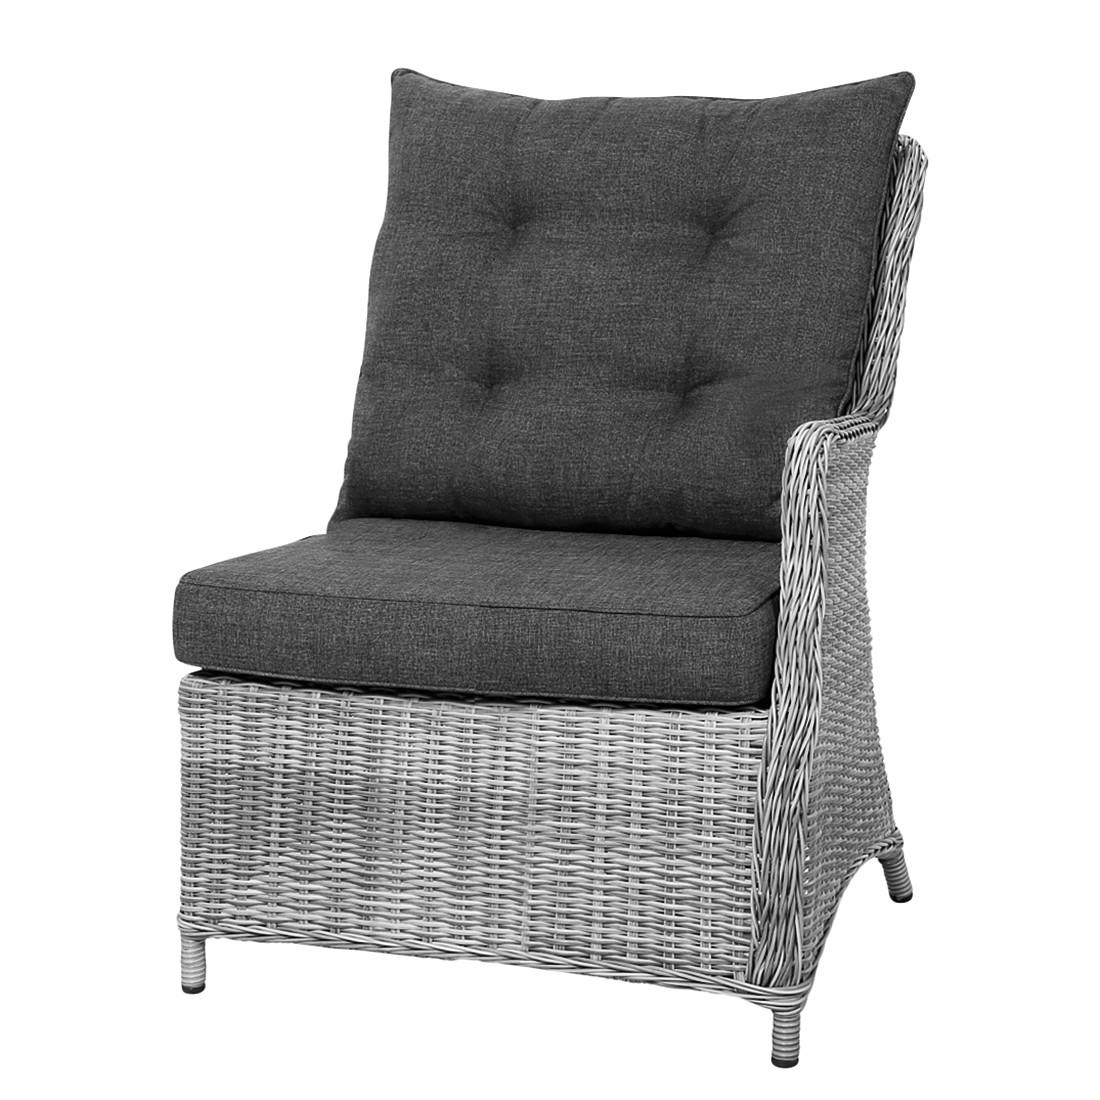 gartensofa barcelona ii polyrattan grau best. Black Bedroom Furniture Sets. Home Design Ideas